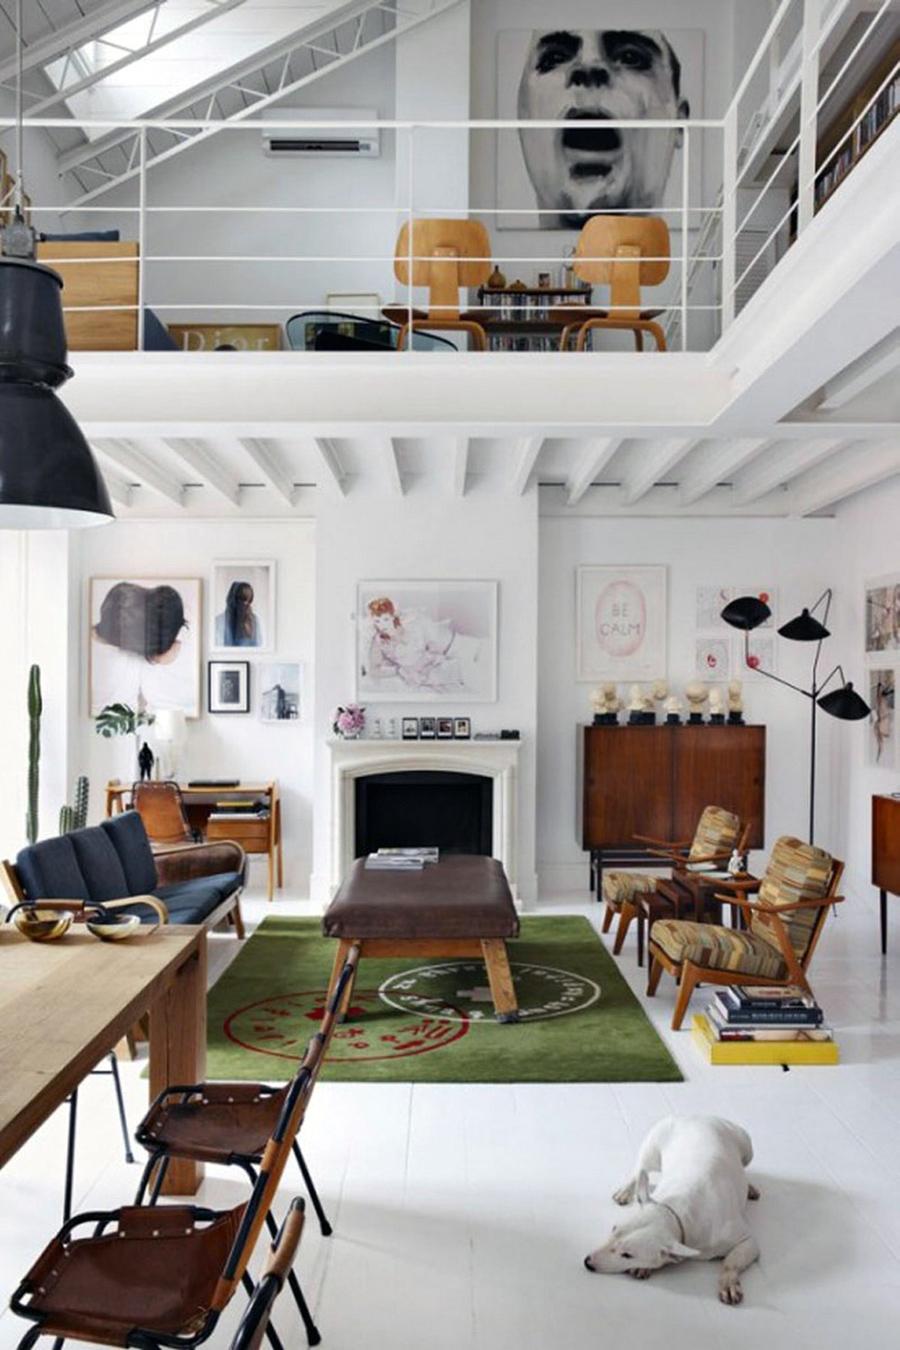 15 bellissime idee per il soppalco - Casa.it